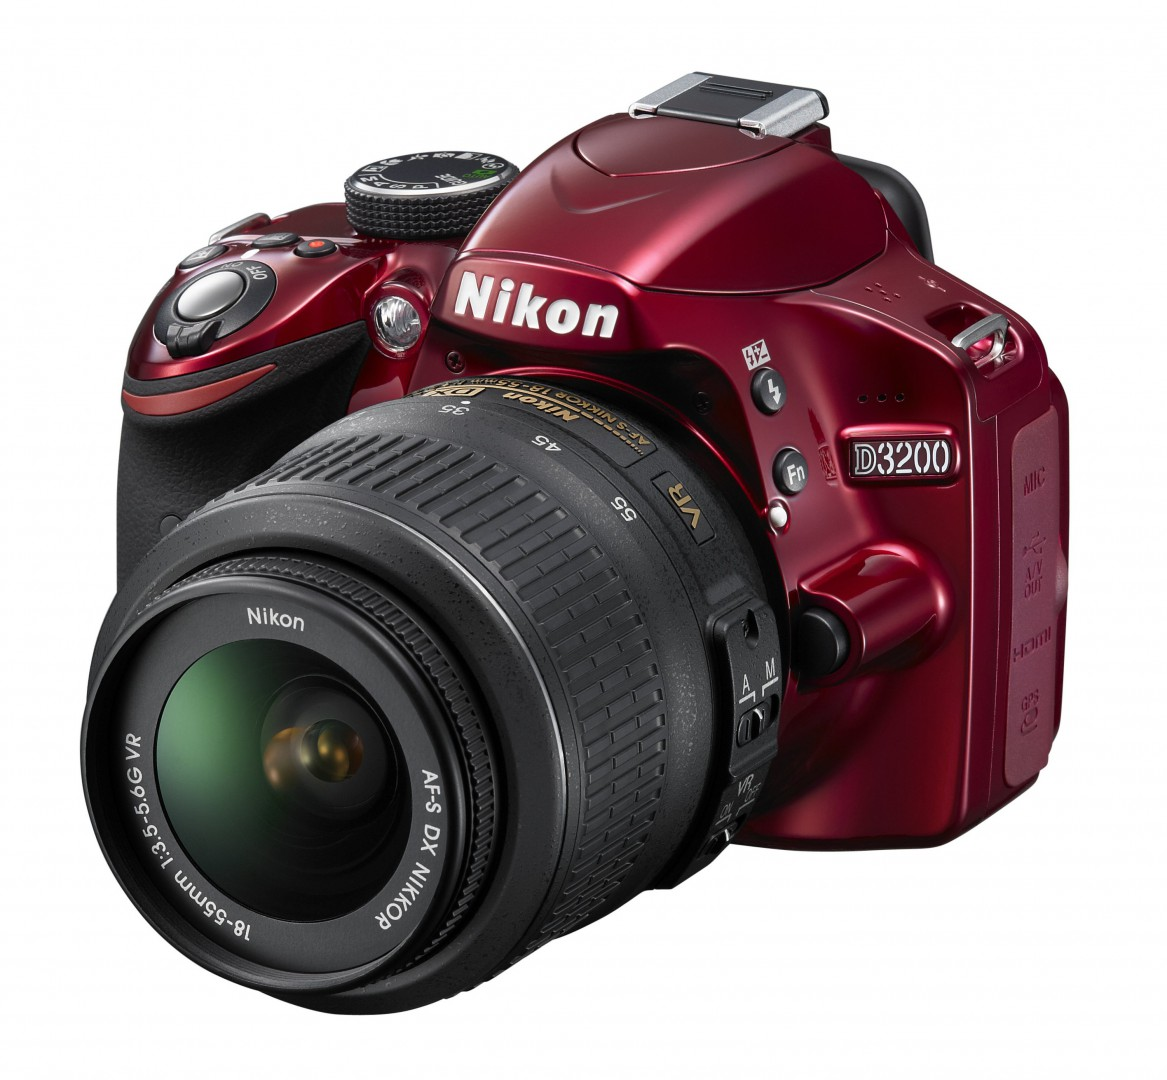 Nikon D3200 und WU-1a: Spiegelreflexkamera per Android steuern - Nikon D3200